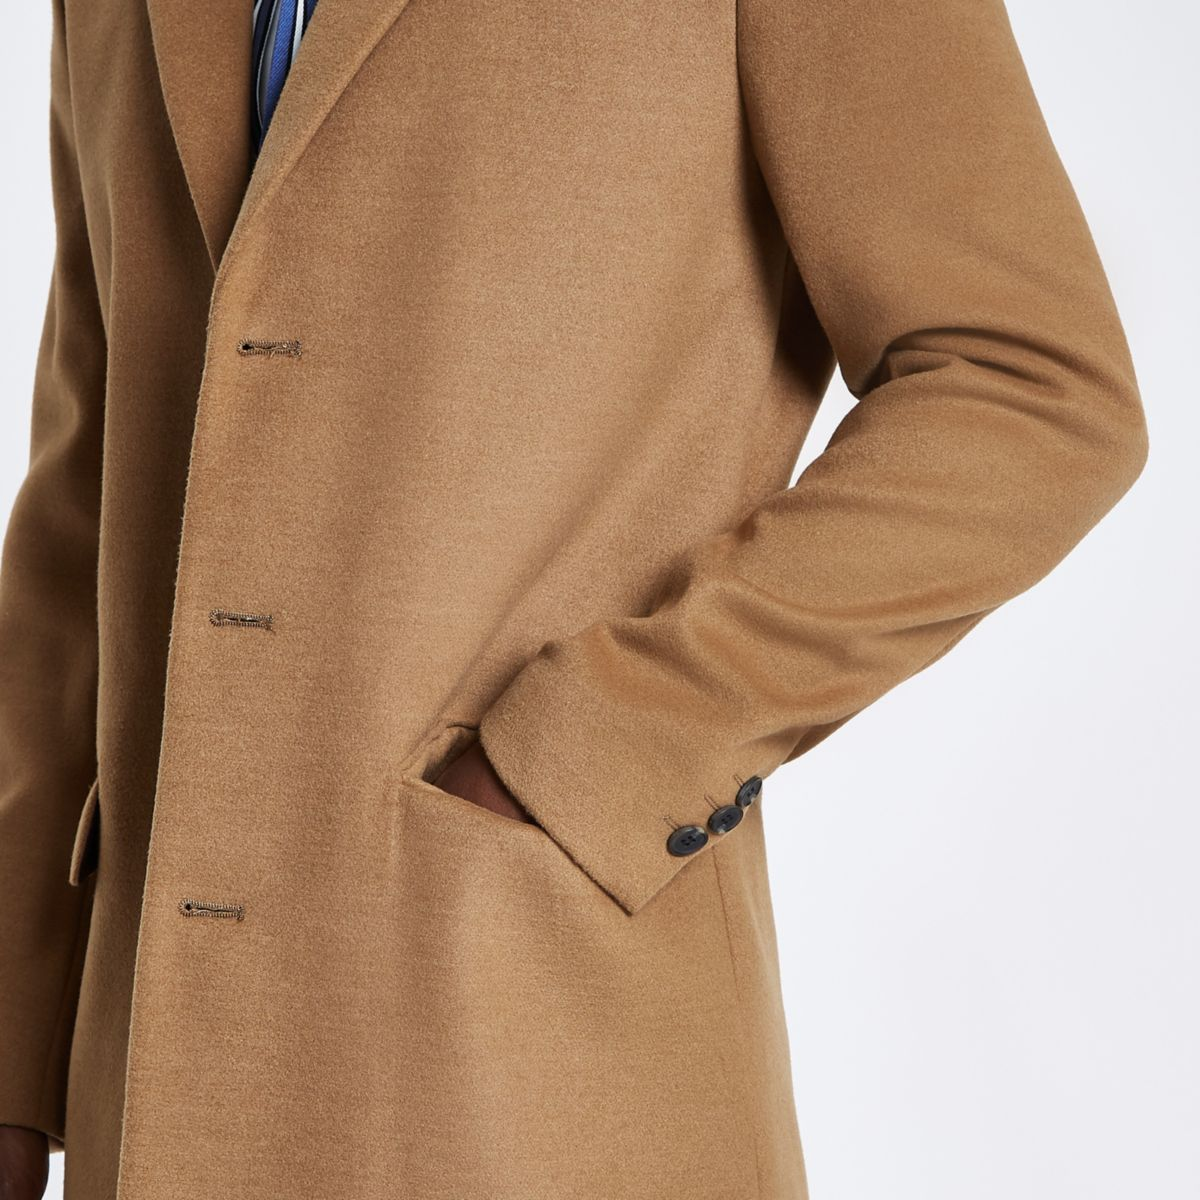 Camel Camel smart smart overcoat Camel overcoat smart overcoat overcoat Camel overcoat smart smart Camel Camel smart w64nqPUXw